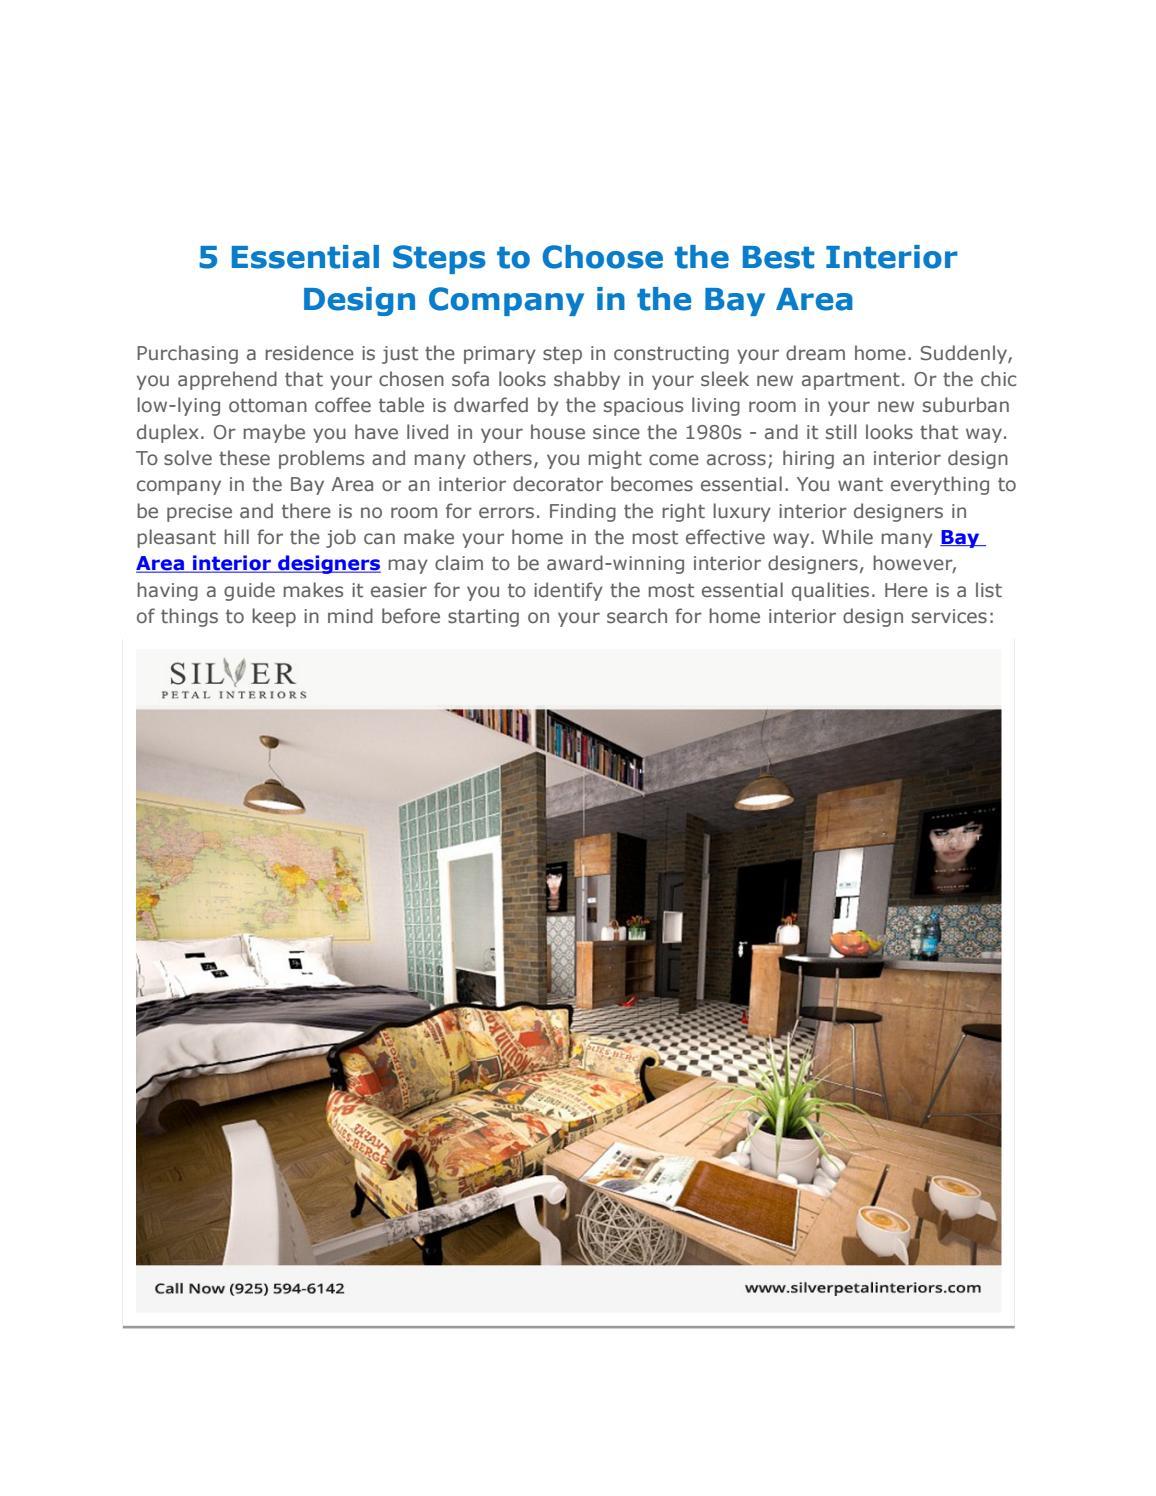 How to choose an interior design company